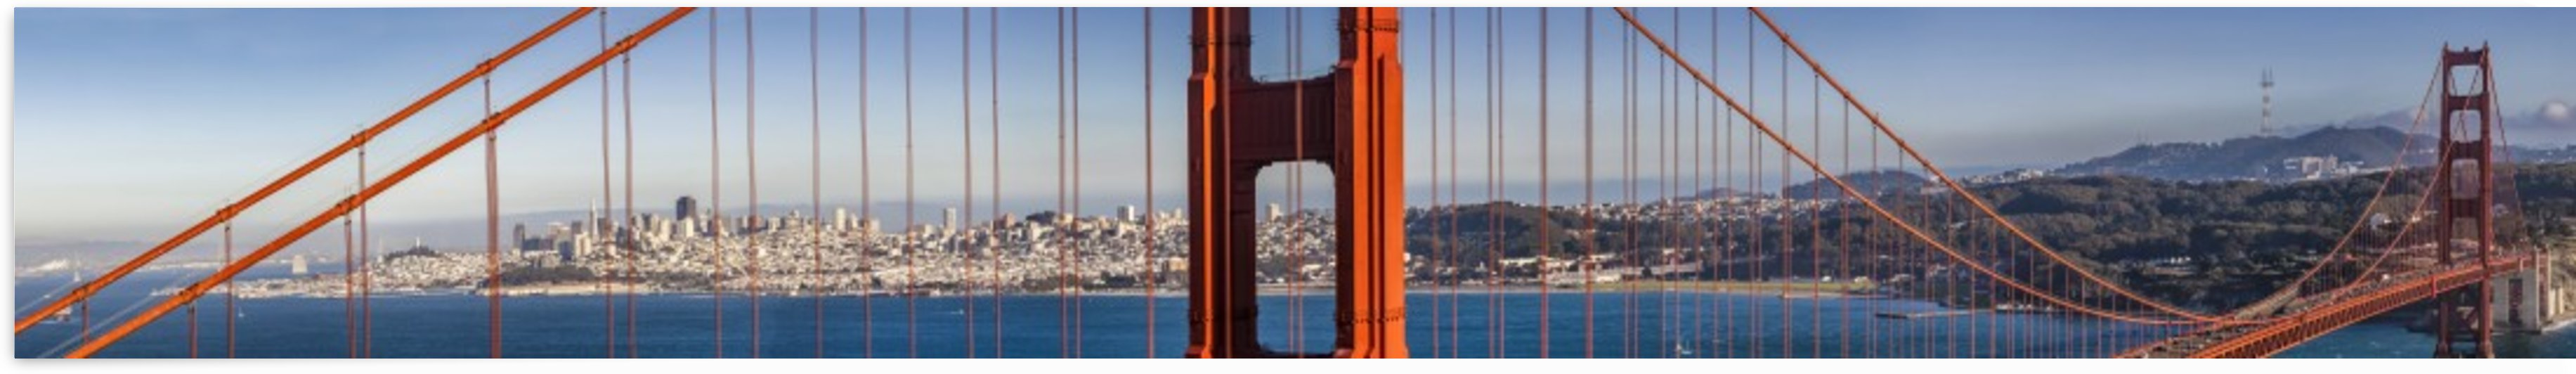 Golden Gate Bridge – Extreme Panoramic View by Melanie Viola